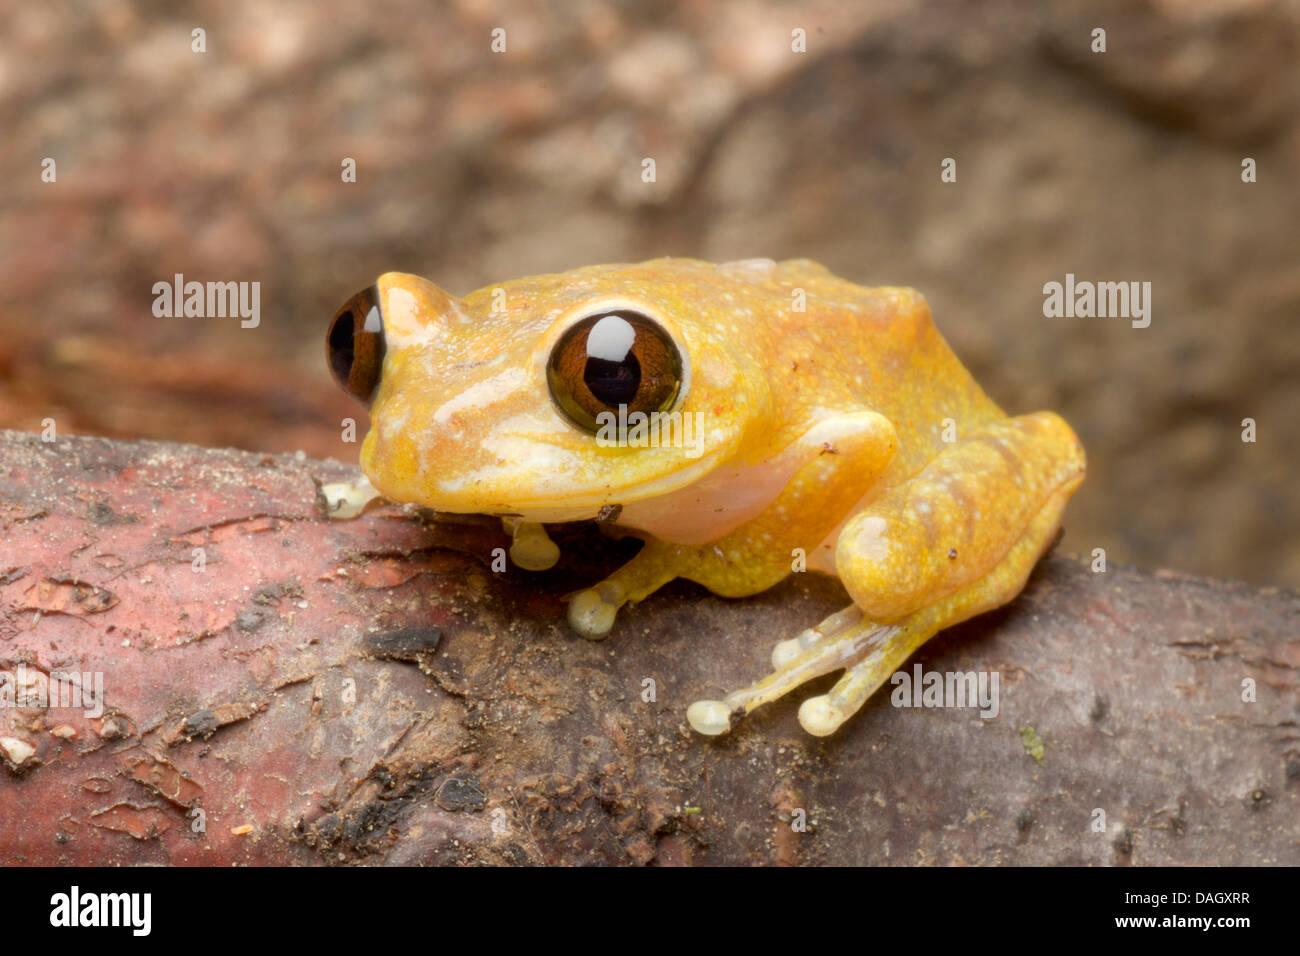 Ruby Eyed Treefrog (Leptopelis uluguruensis), on a branch - Stock Image